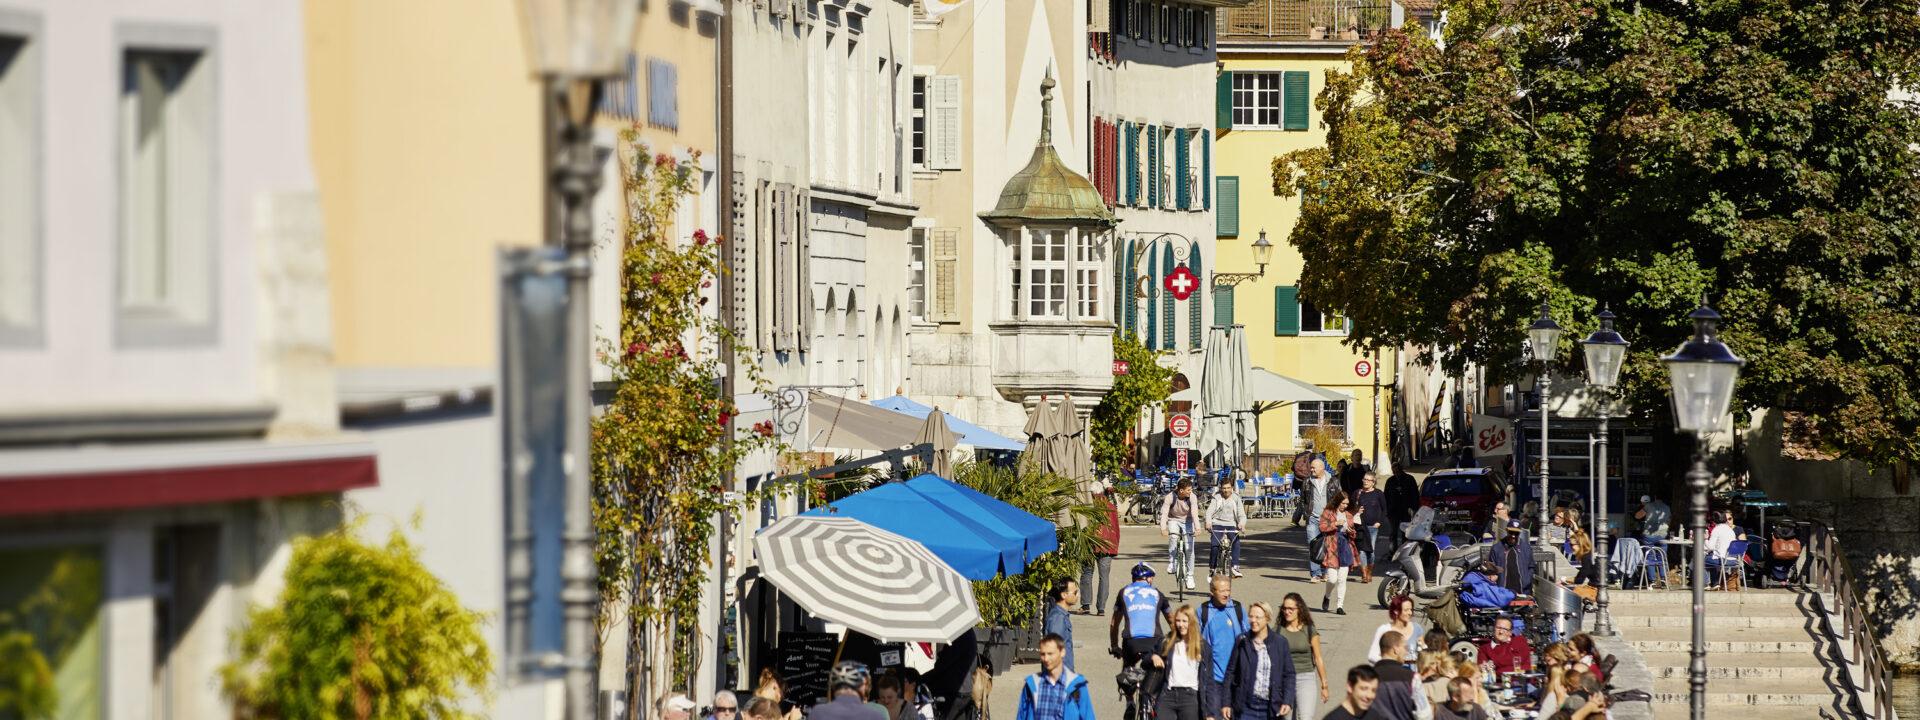 SommerSpass in Solothurn - Reise 1